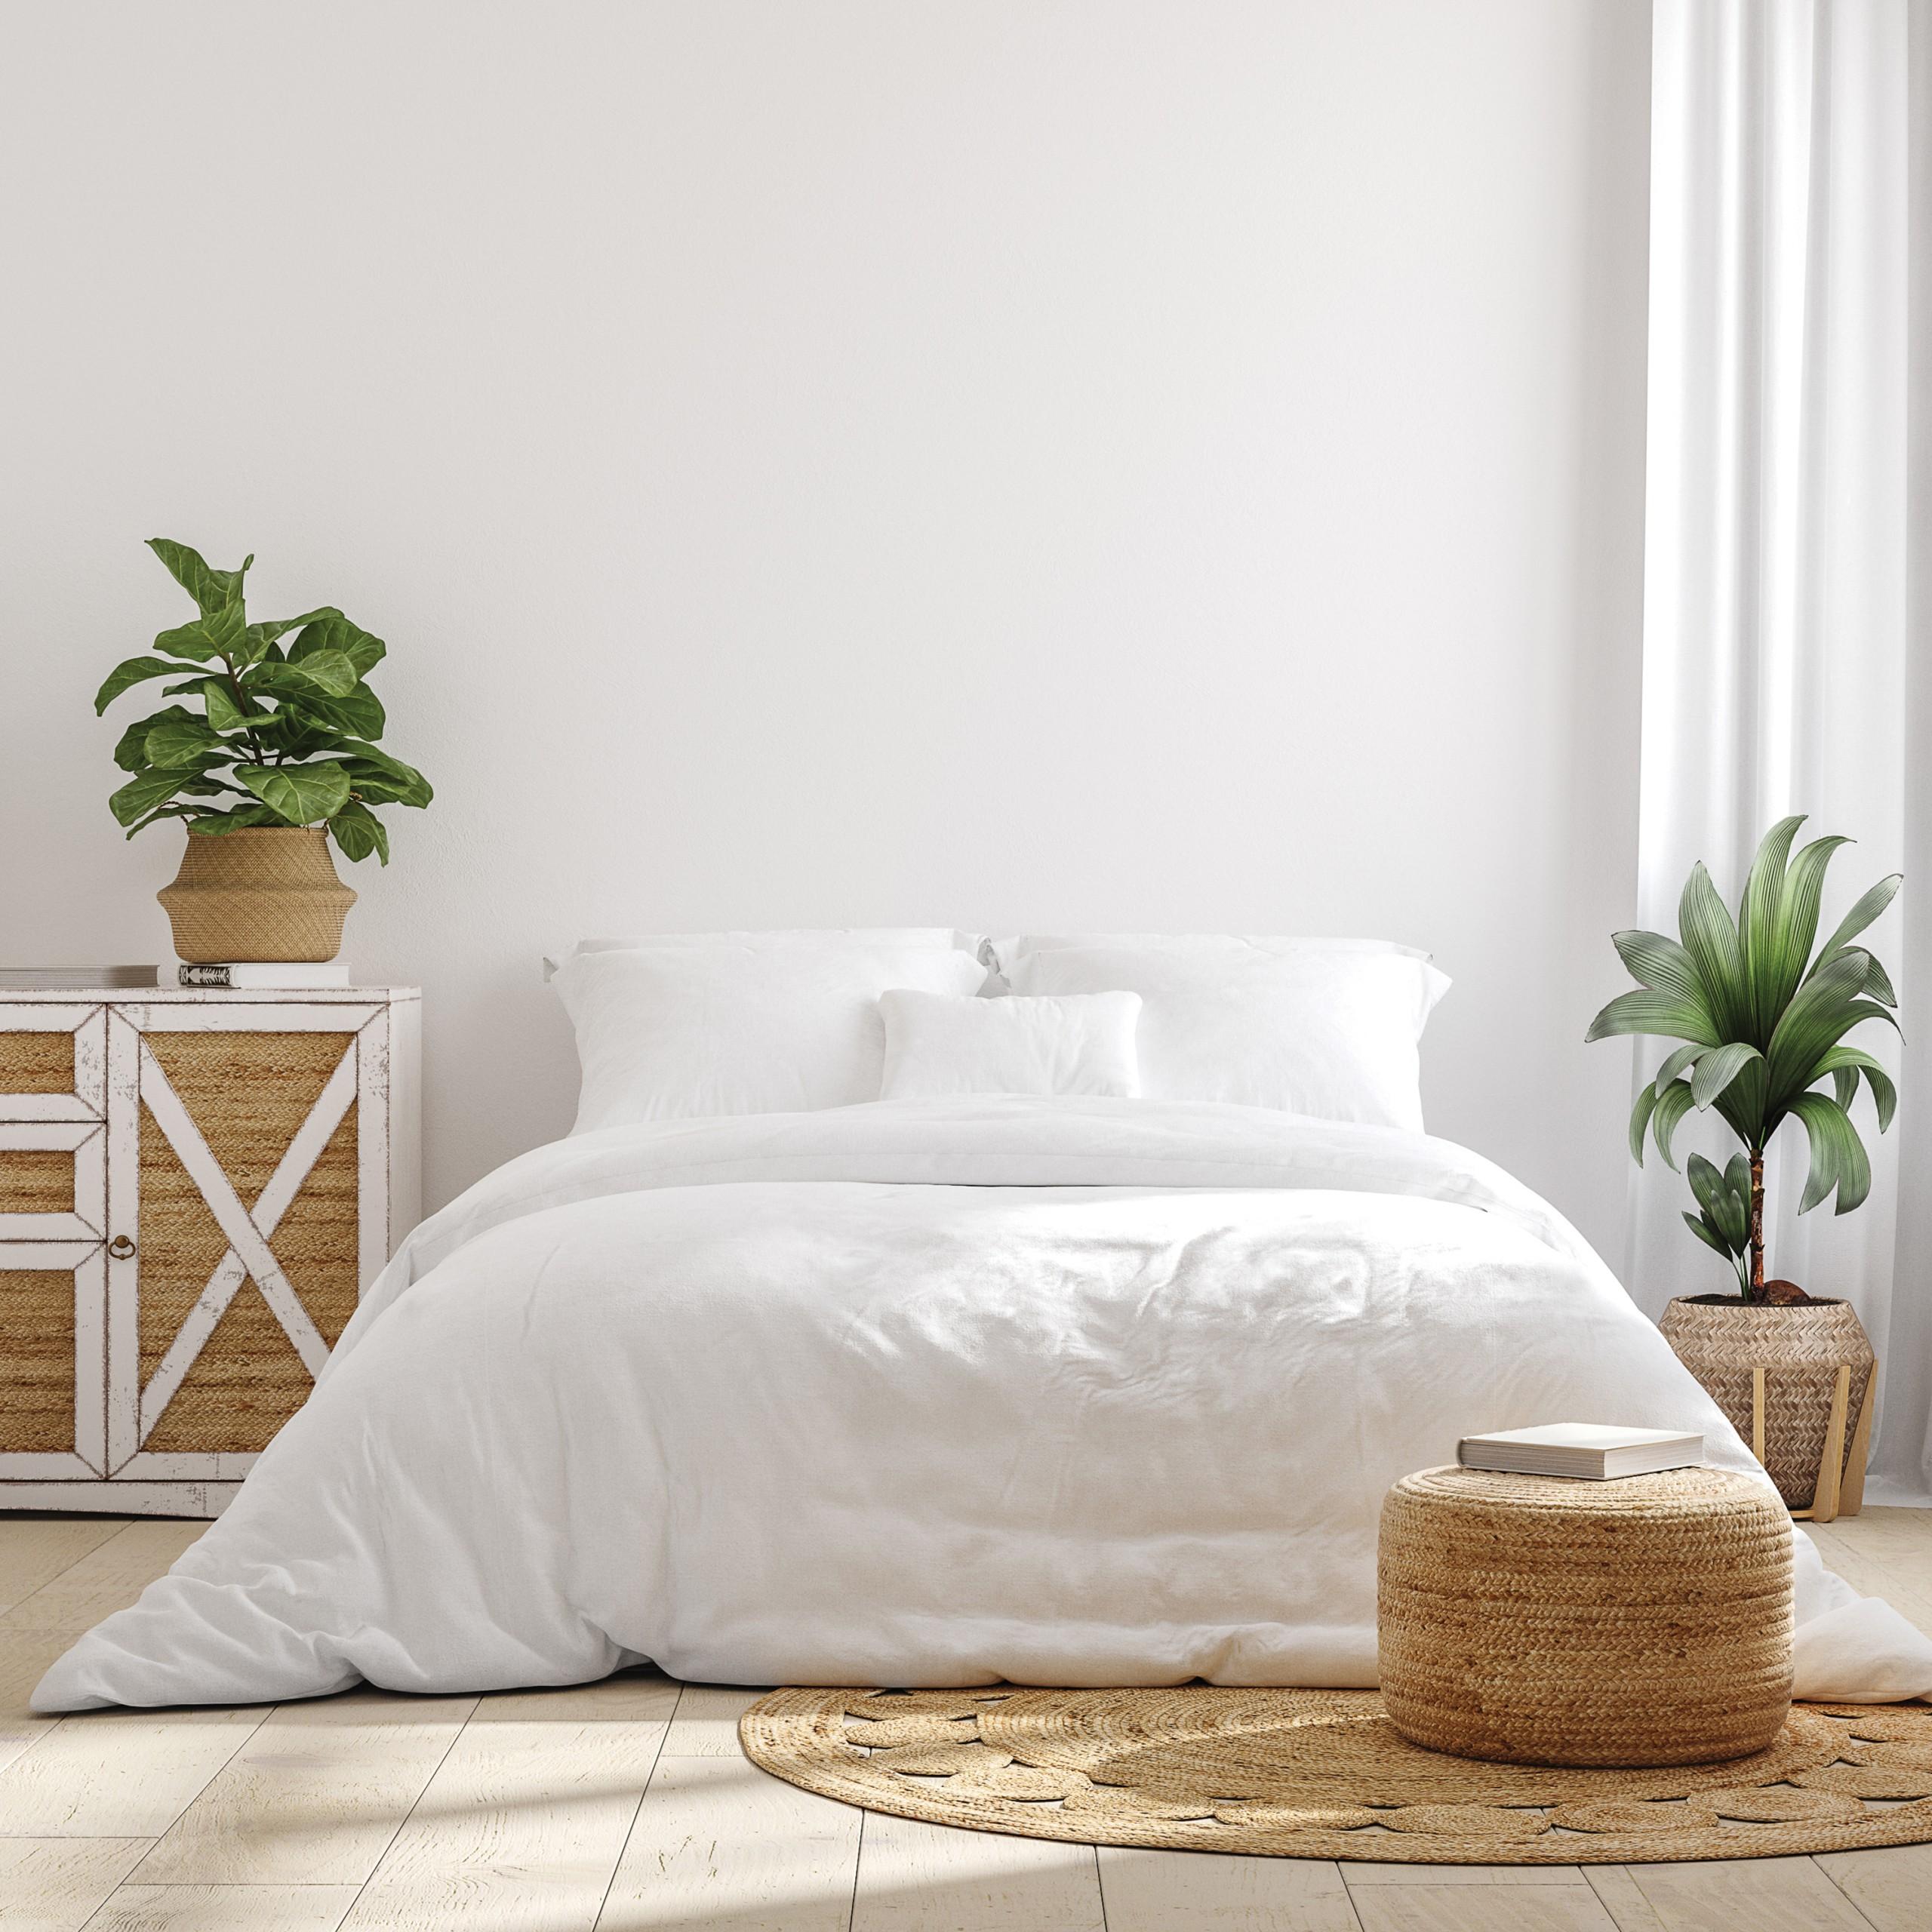 White Cozy Farmhouse Bedroom Interior